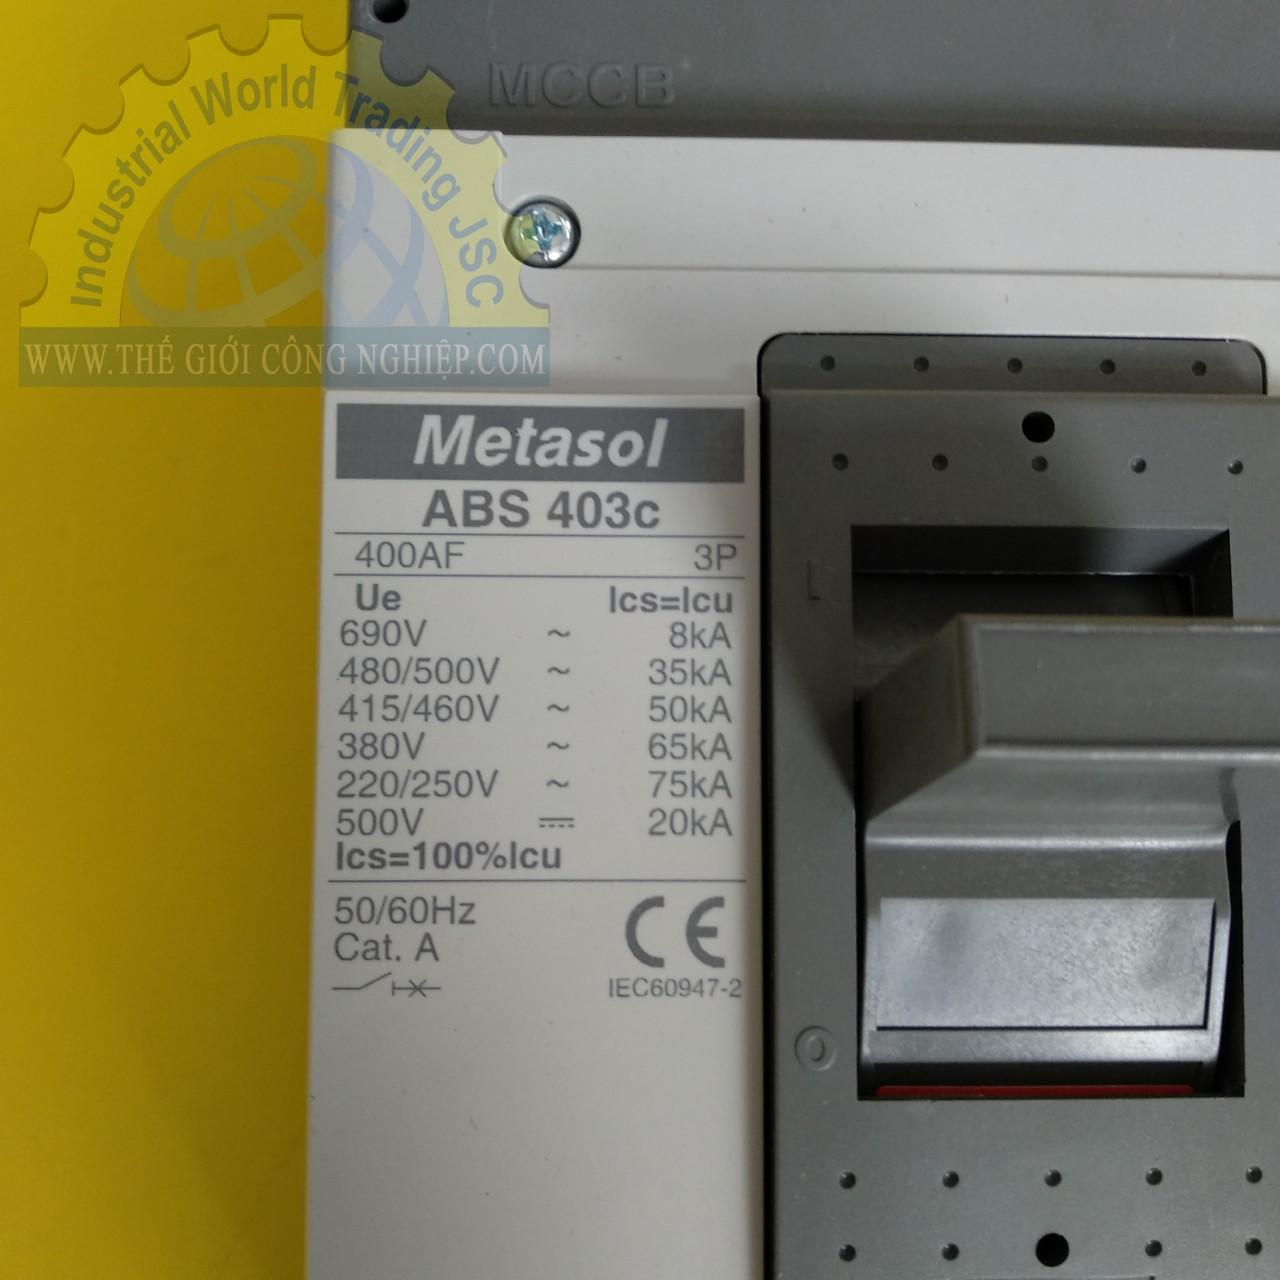 MCCB 3P LS ABS403c 400A (65kA) ABS403C 400A (65kA) LS